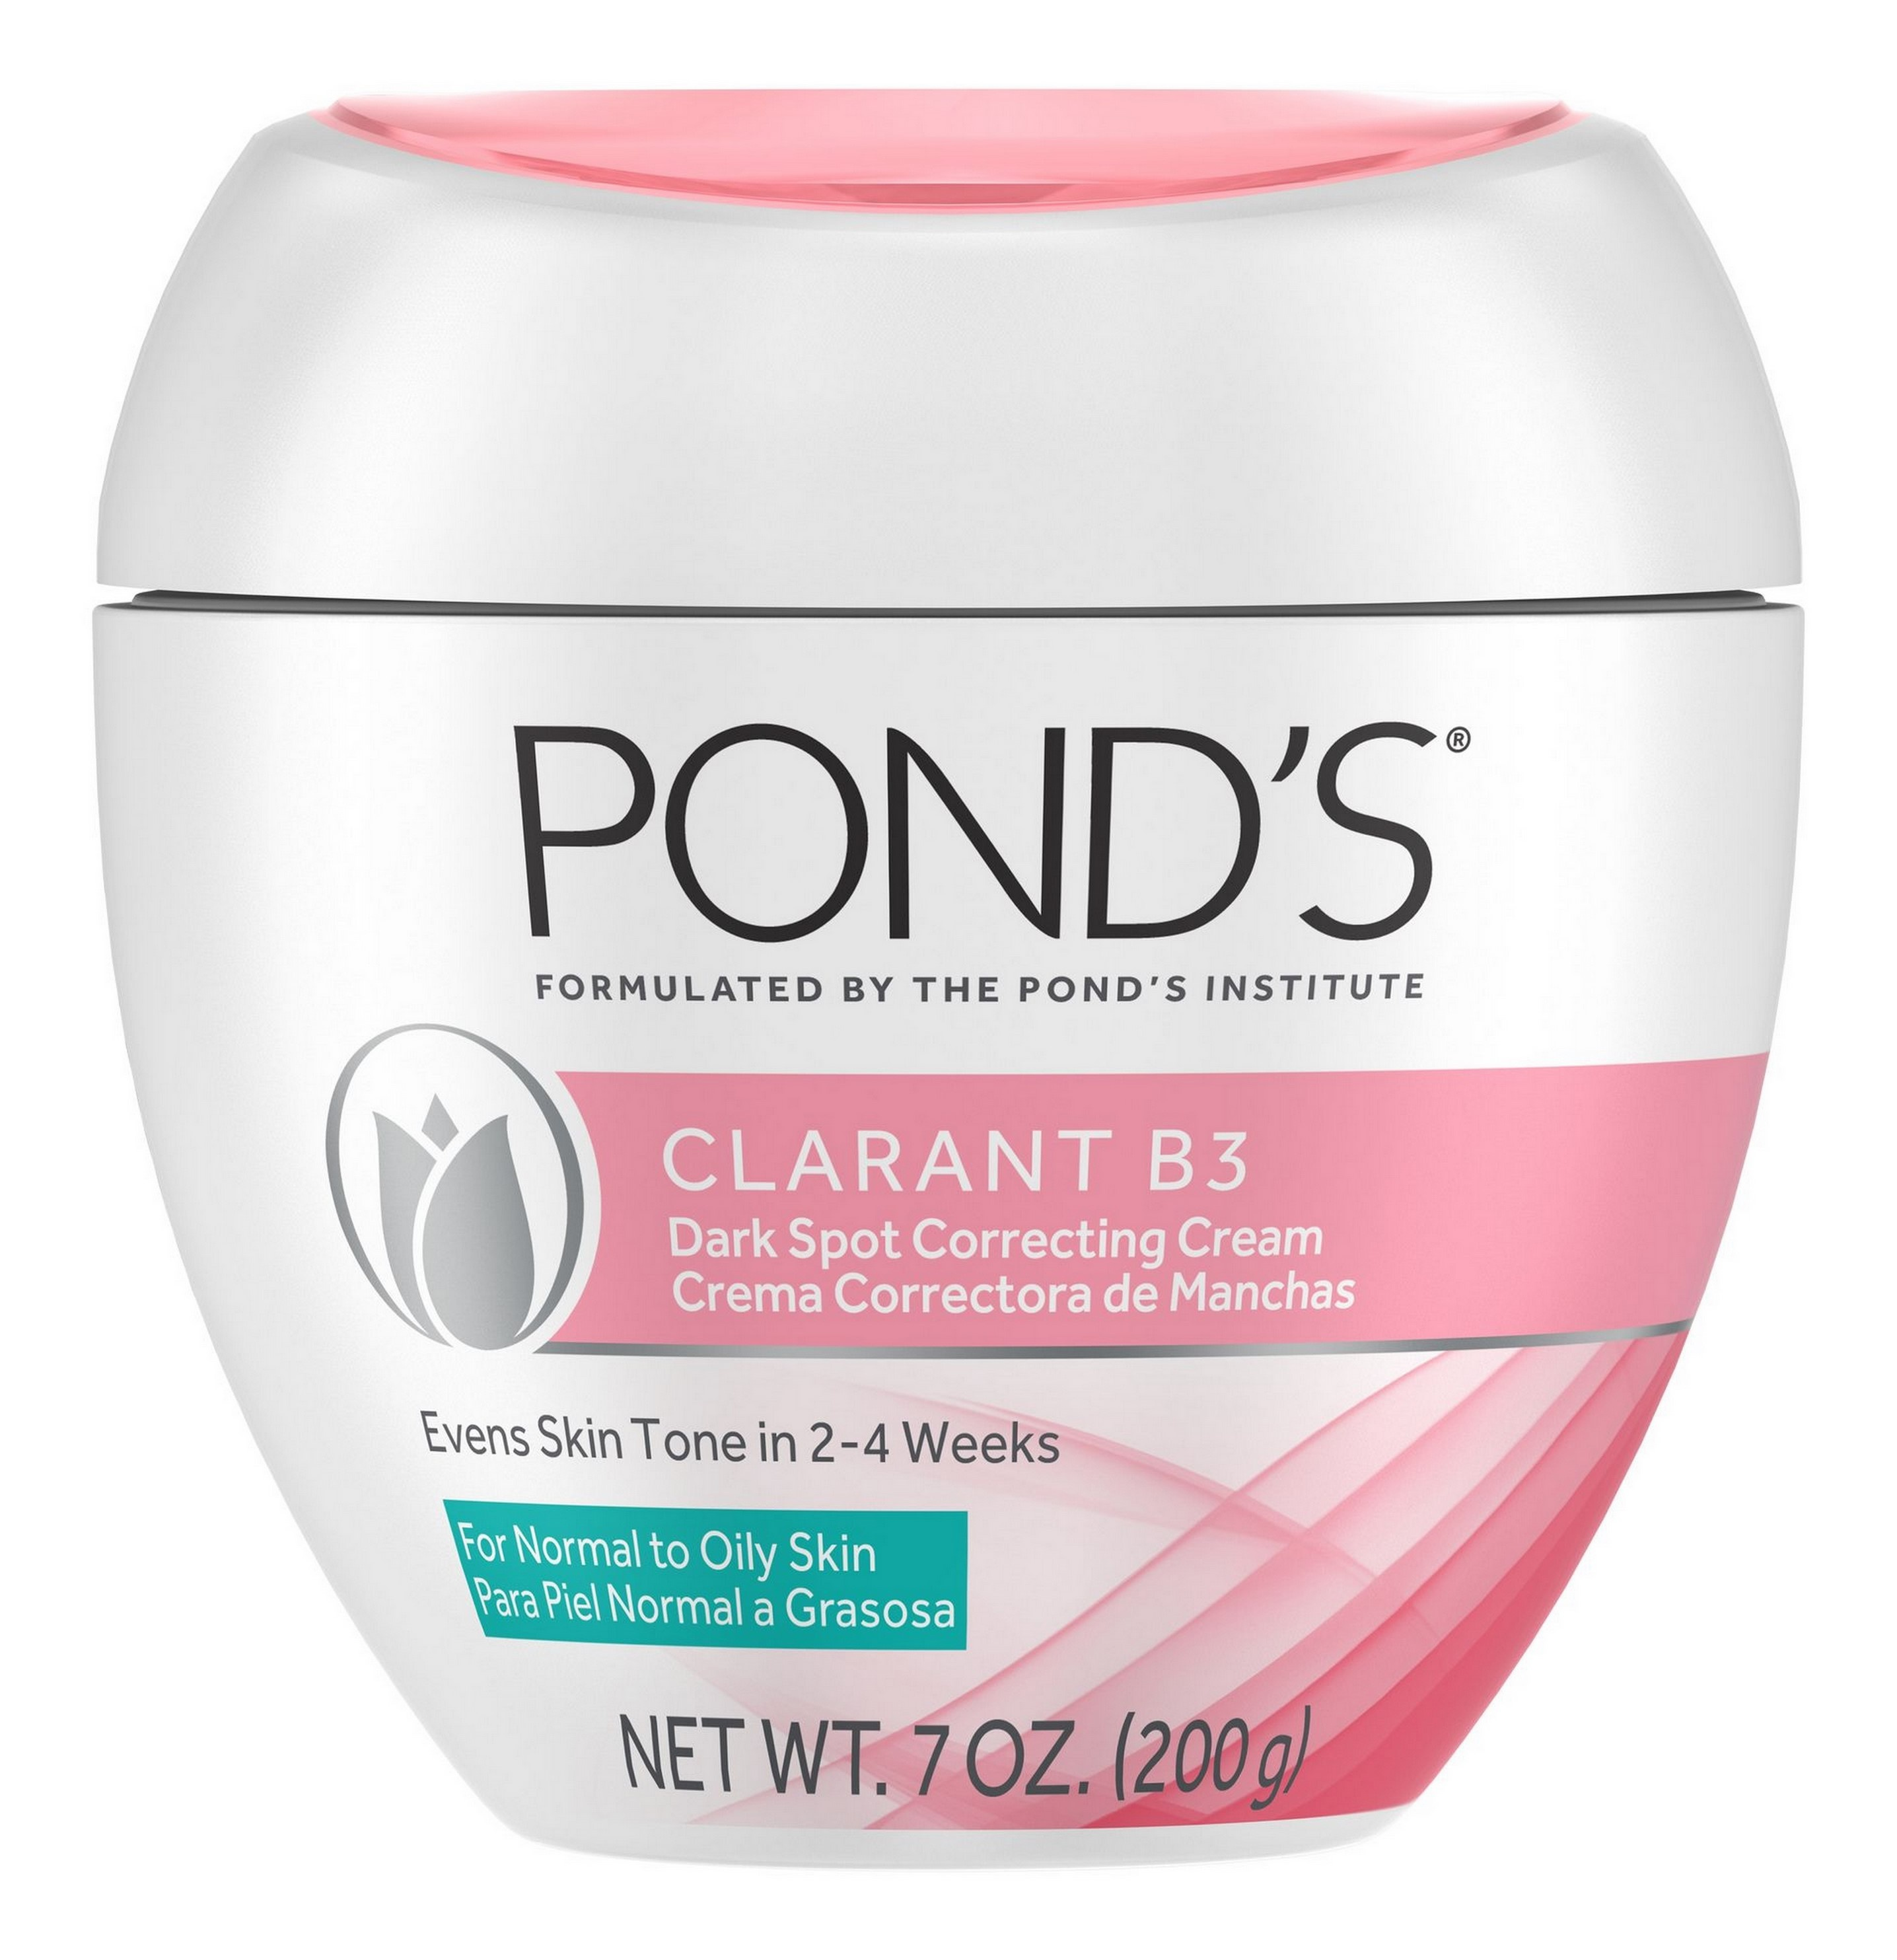 Pond's  Clarant B3 Dark Spot Correcting Cream (Normal to Oily)